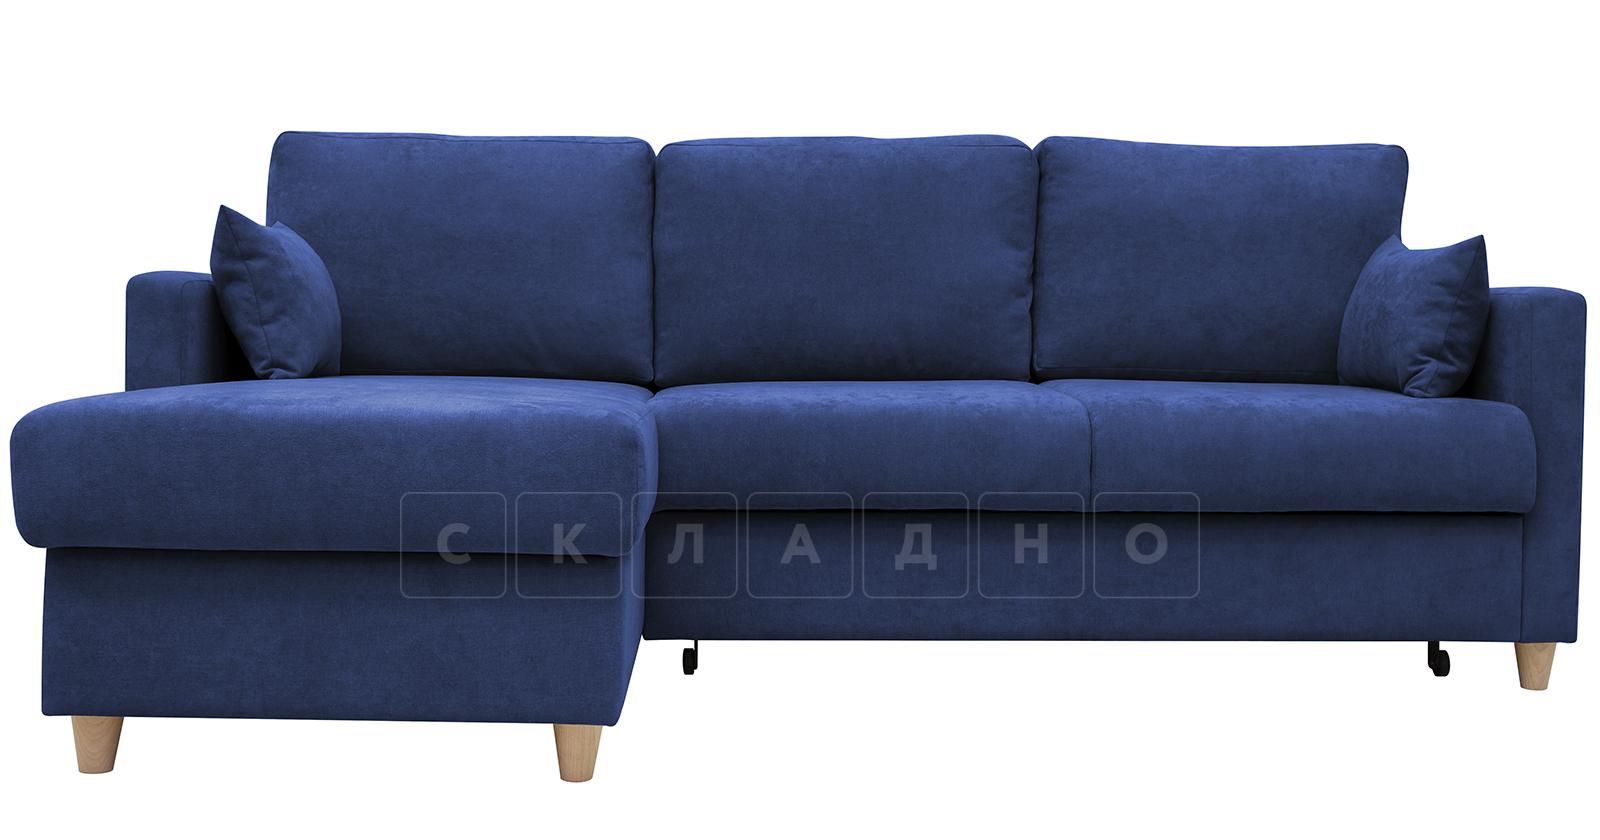 Угловой диван Дарвин темно-синий фото 1 | интернет-магазин Складно